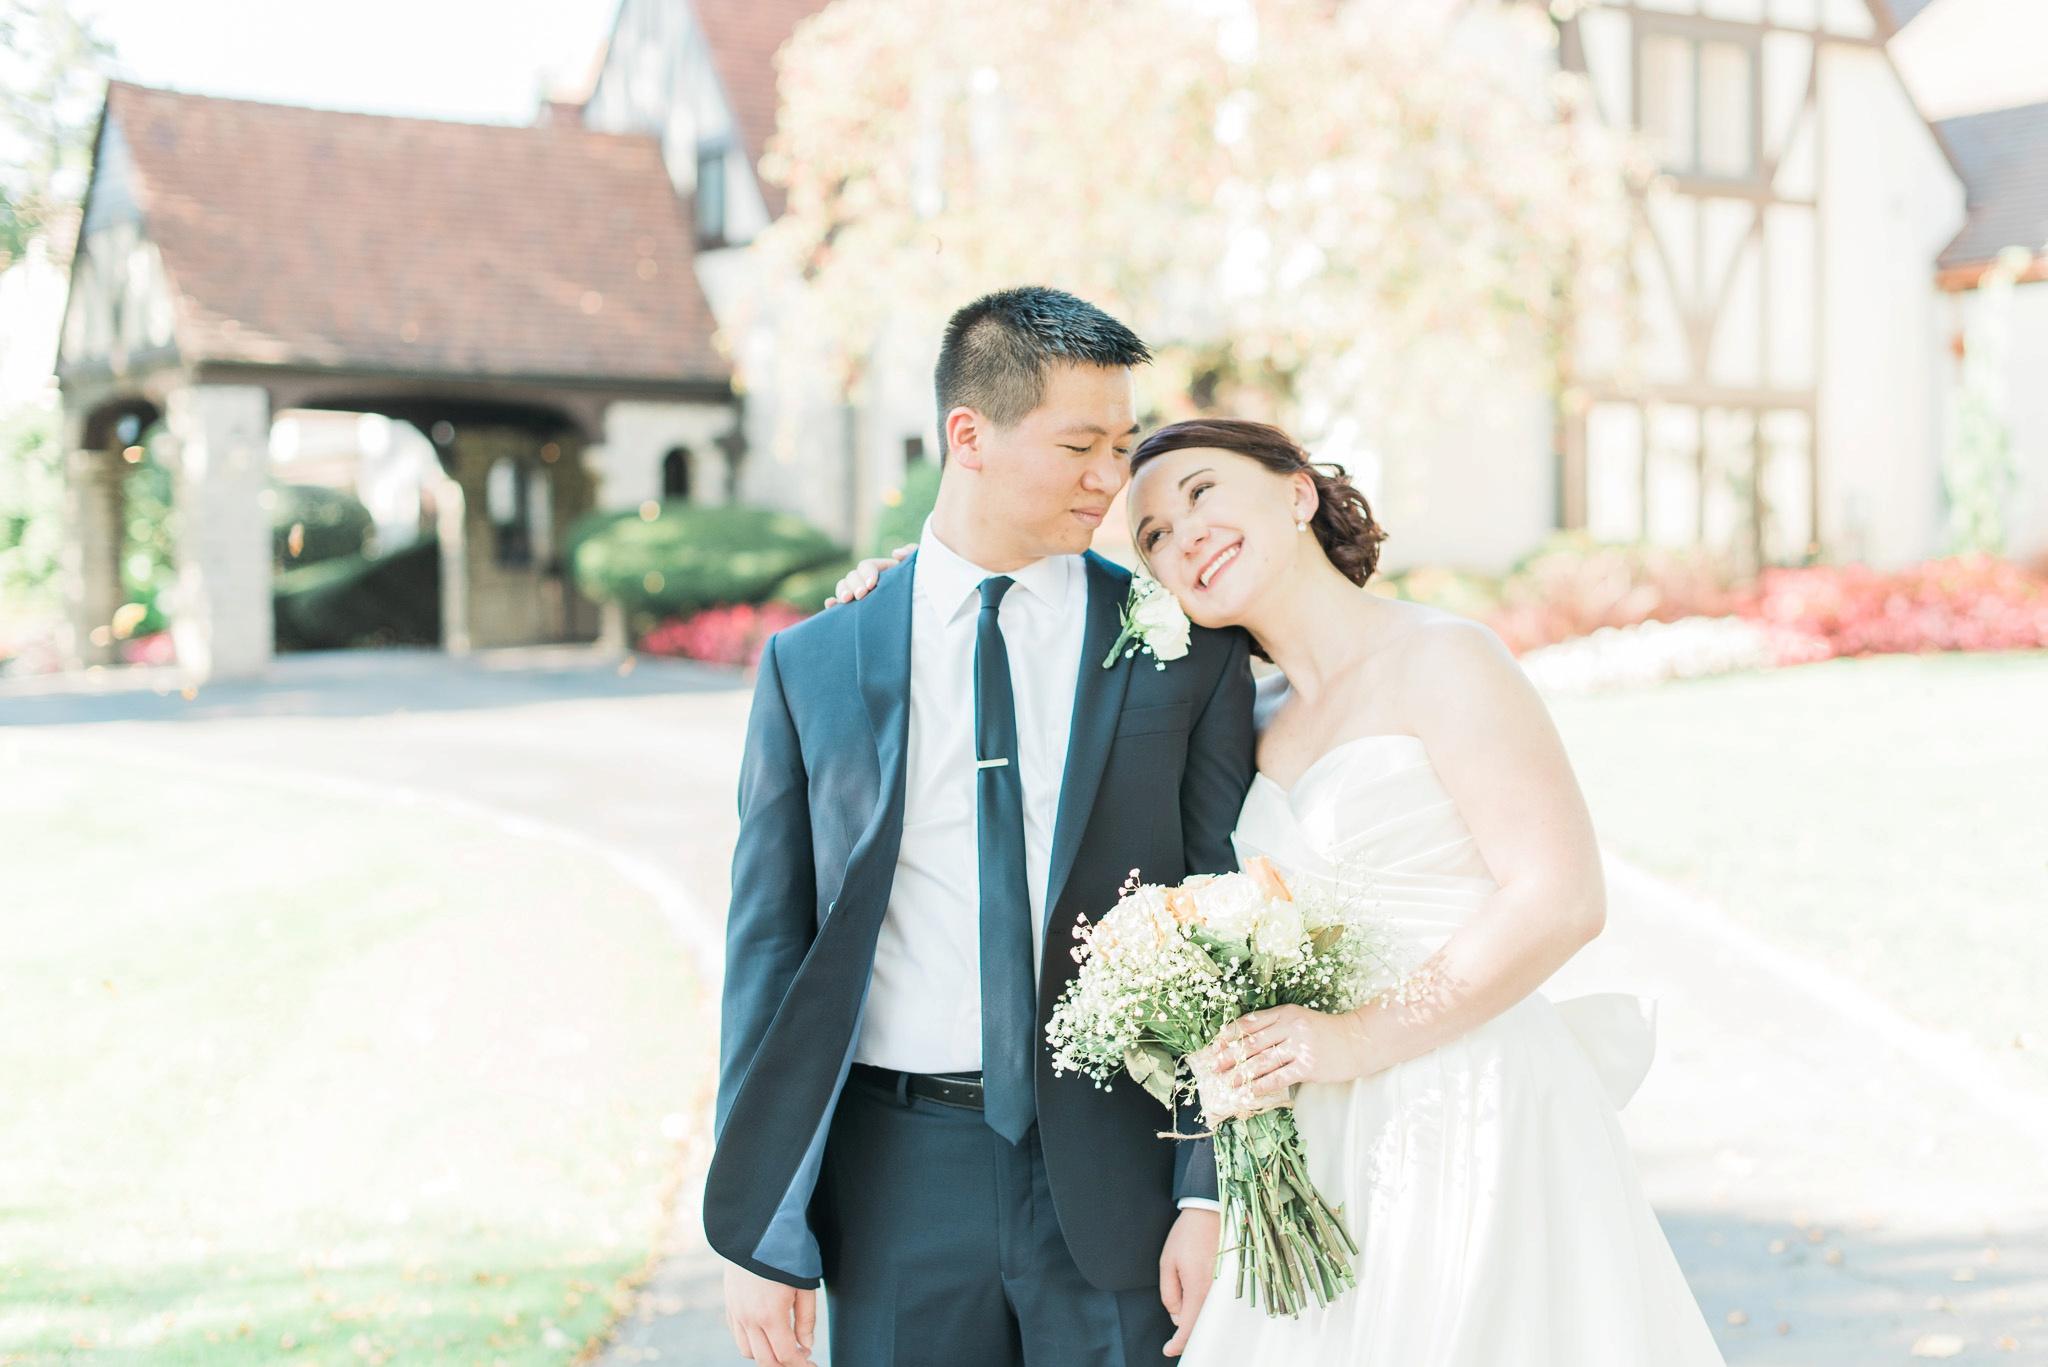 brookside-golf-country-club-wedding-columbus-ohio-90.jpg